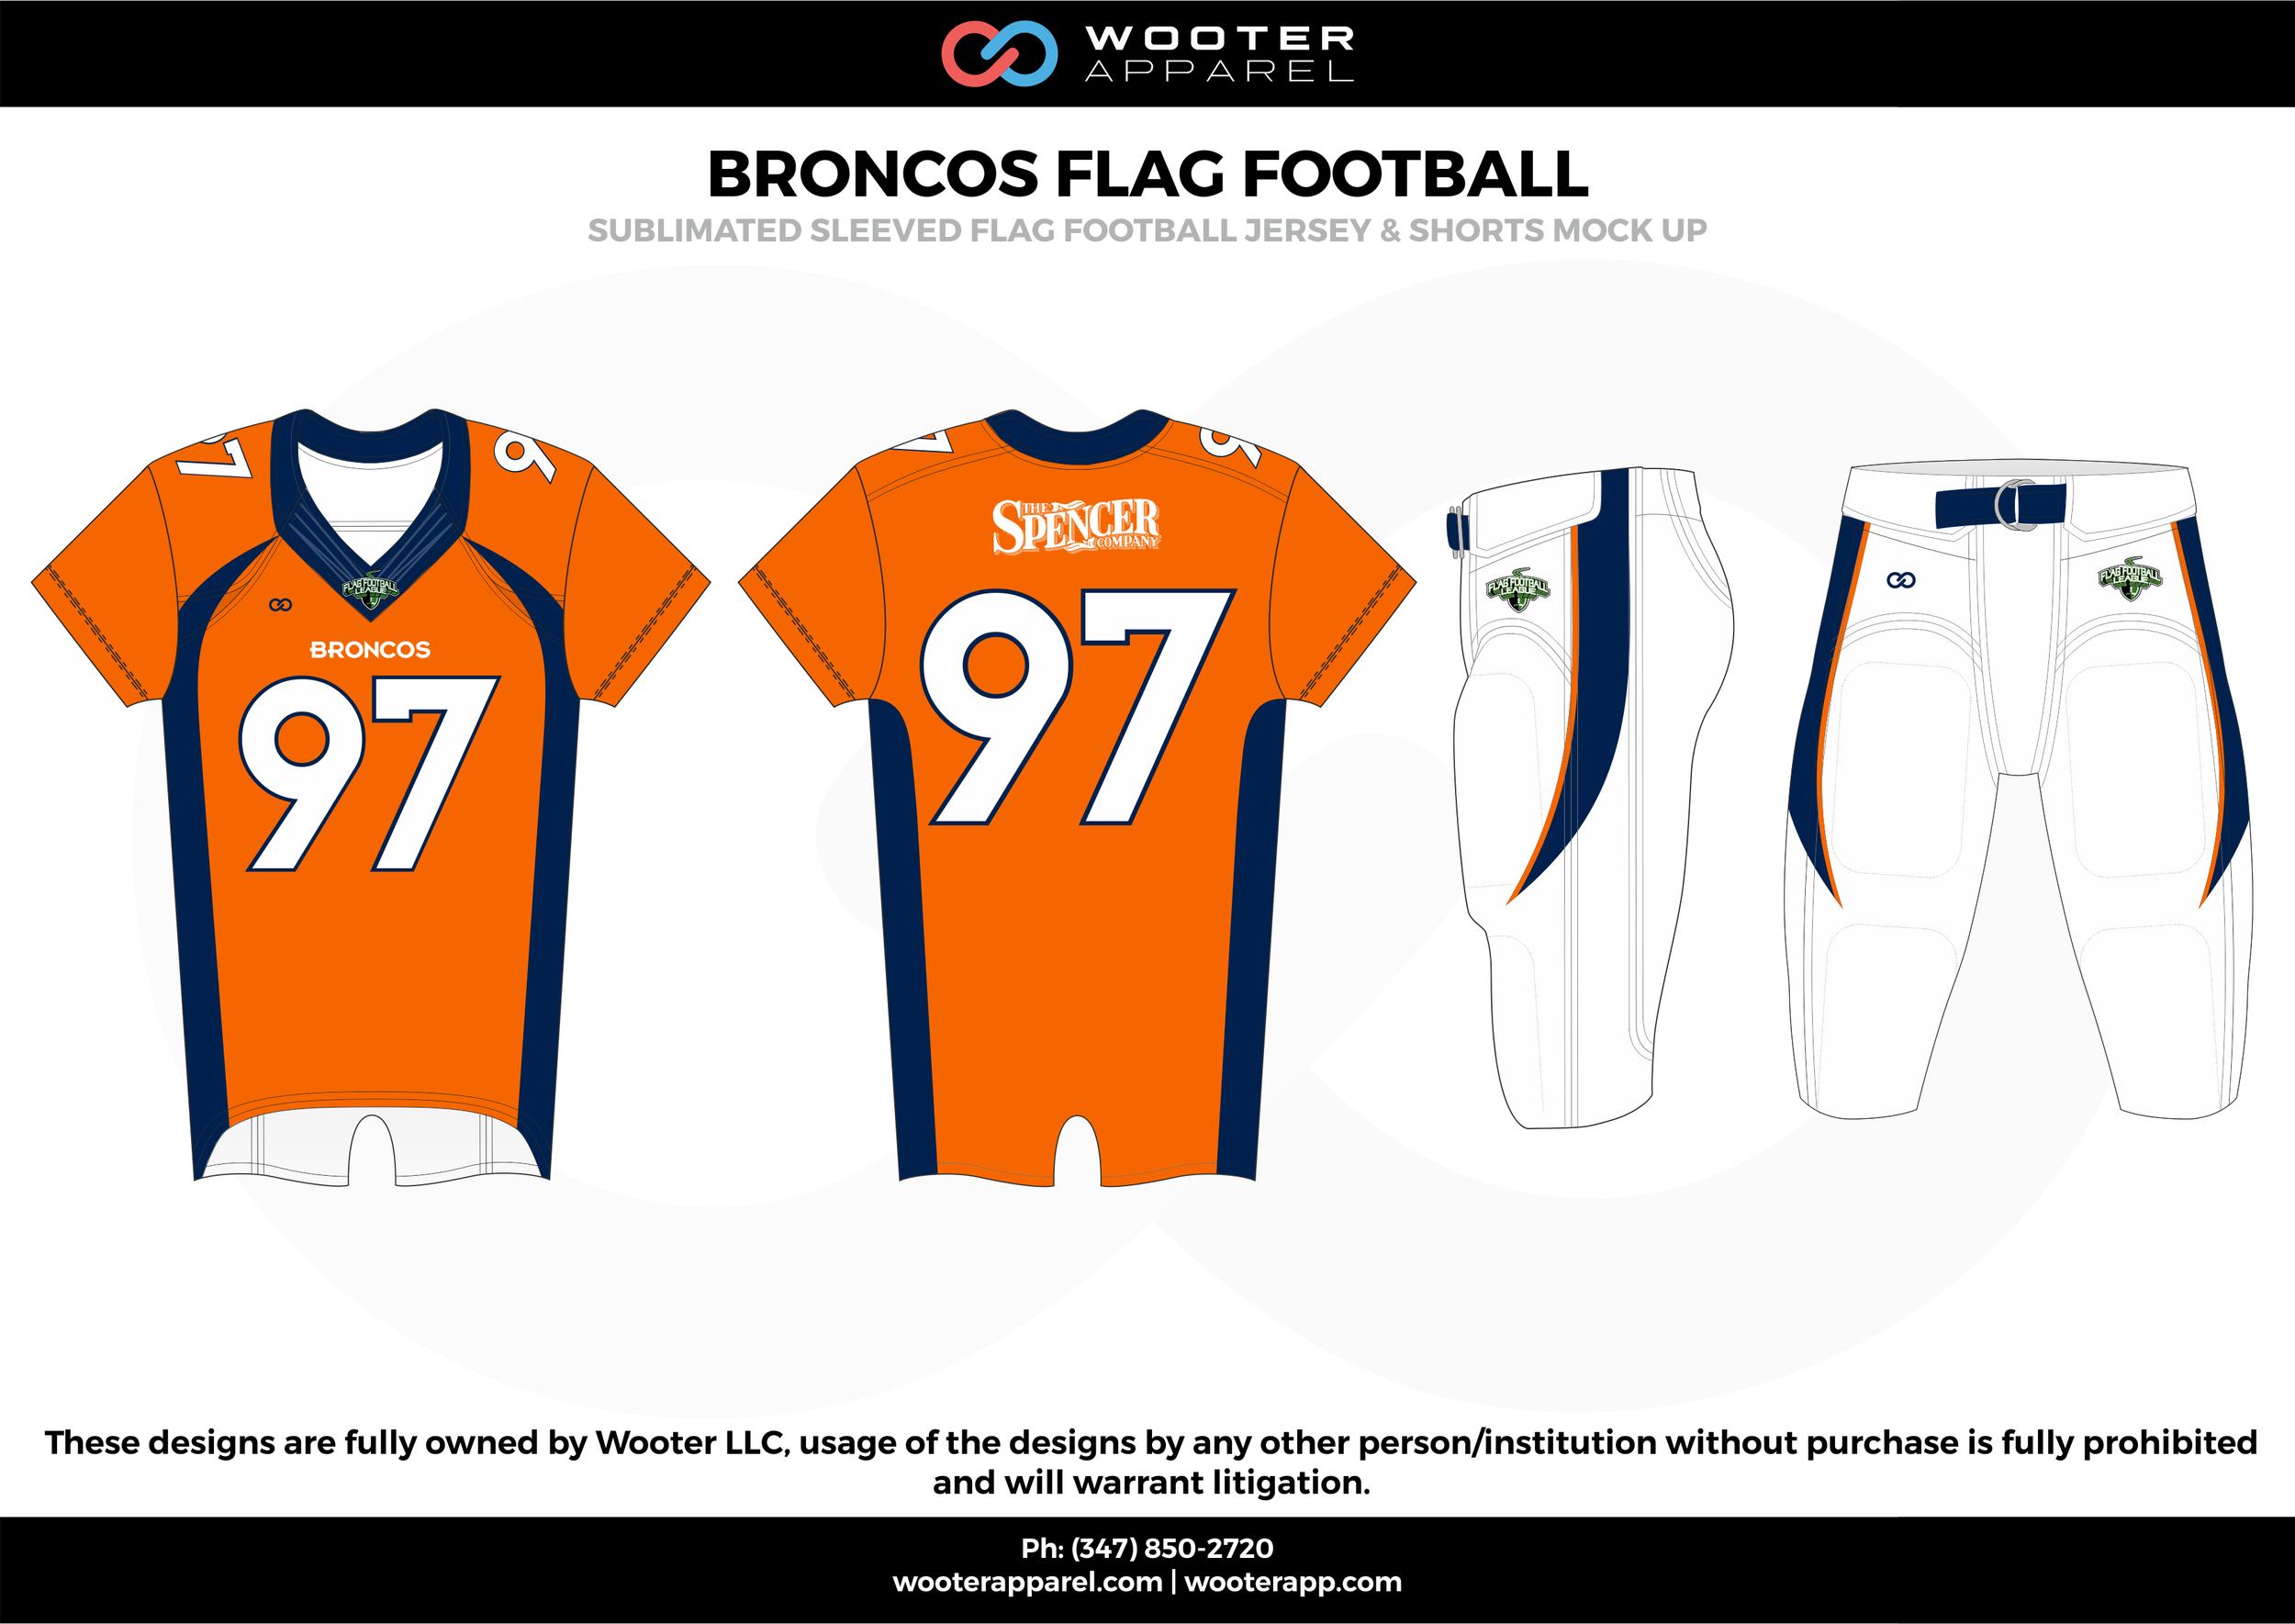 BRONCOS FLAG FOOTBALL orange white blue flag football uniforms jerseys pants